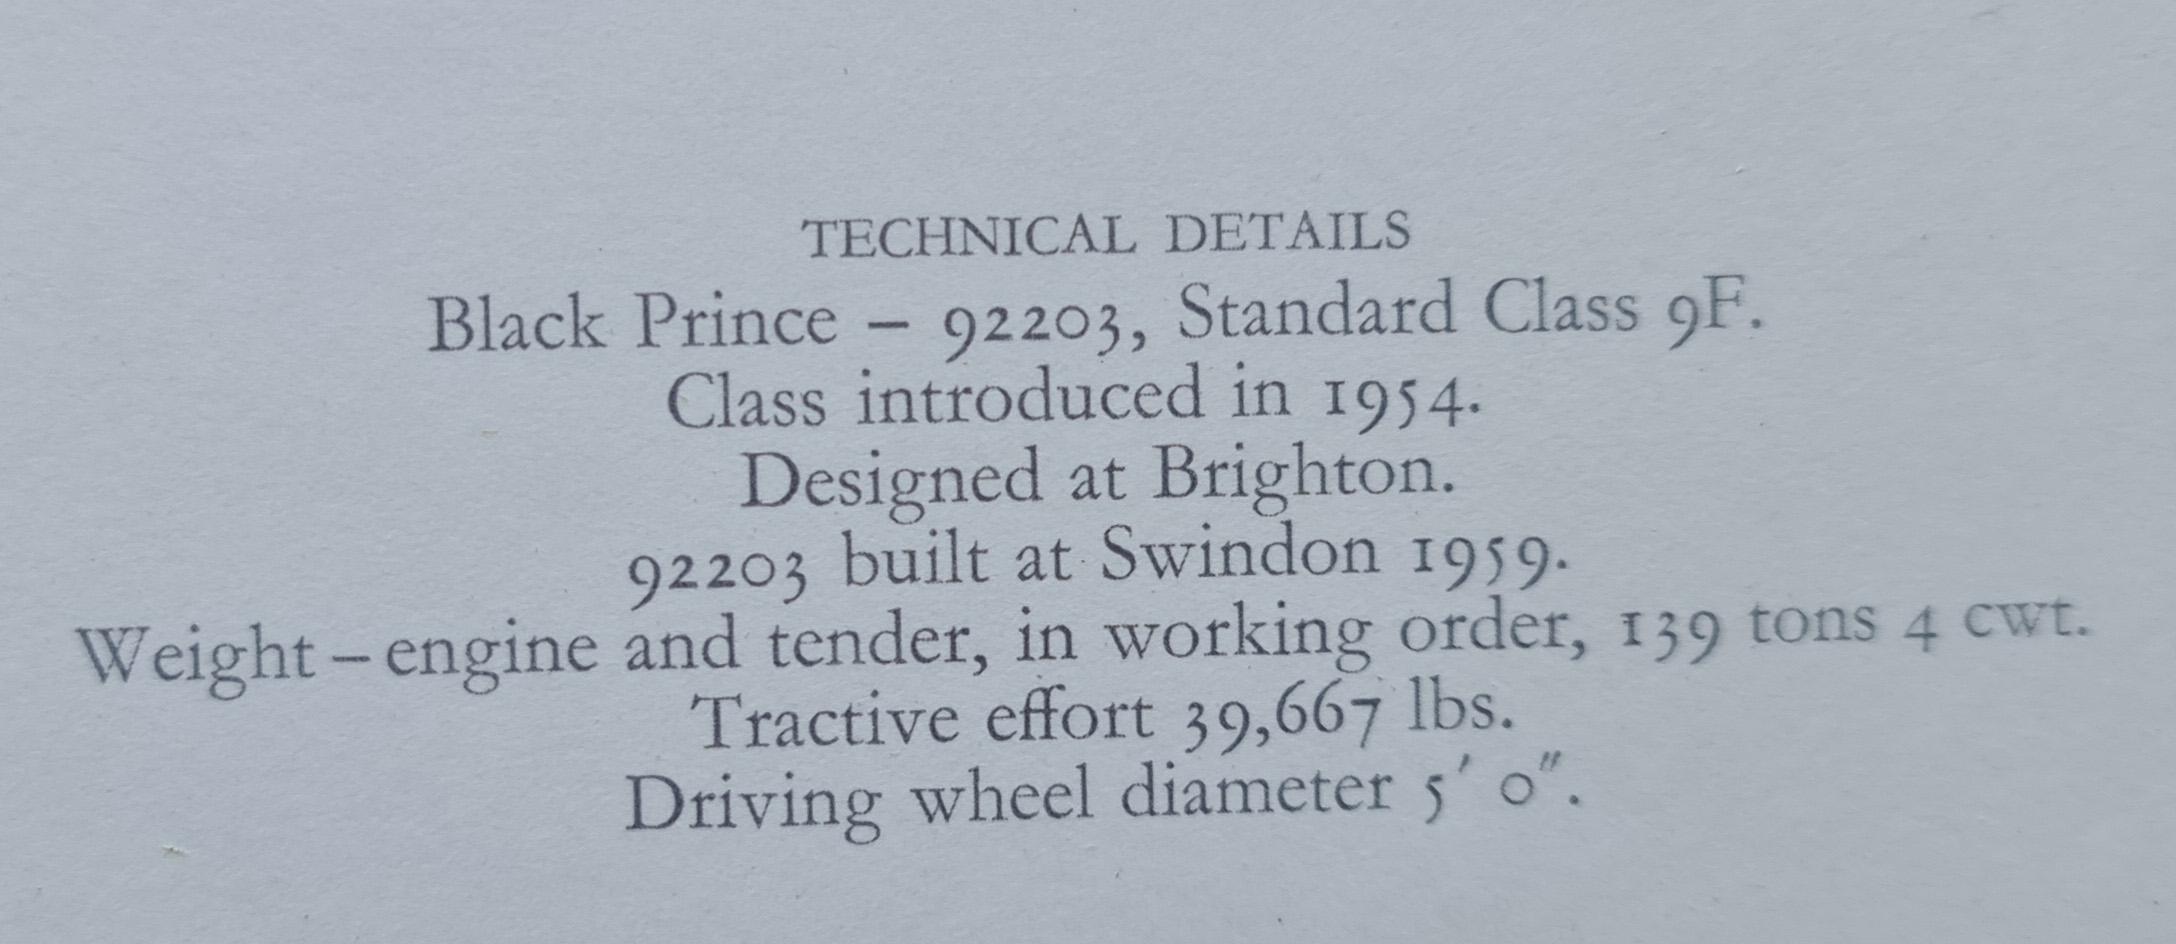 black prince technical details